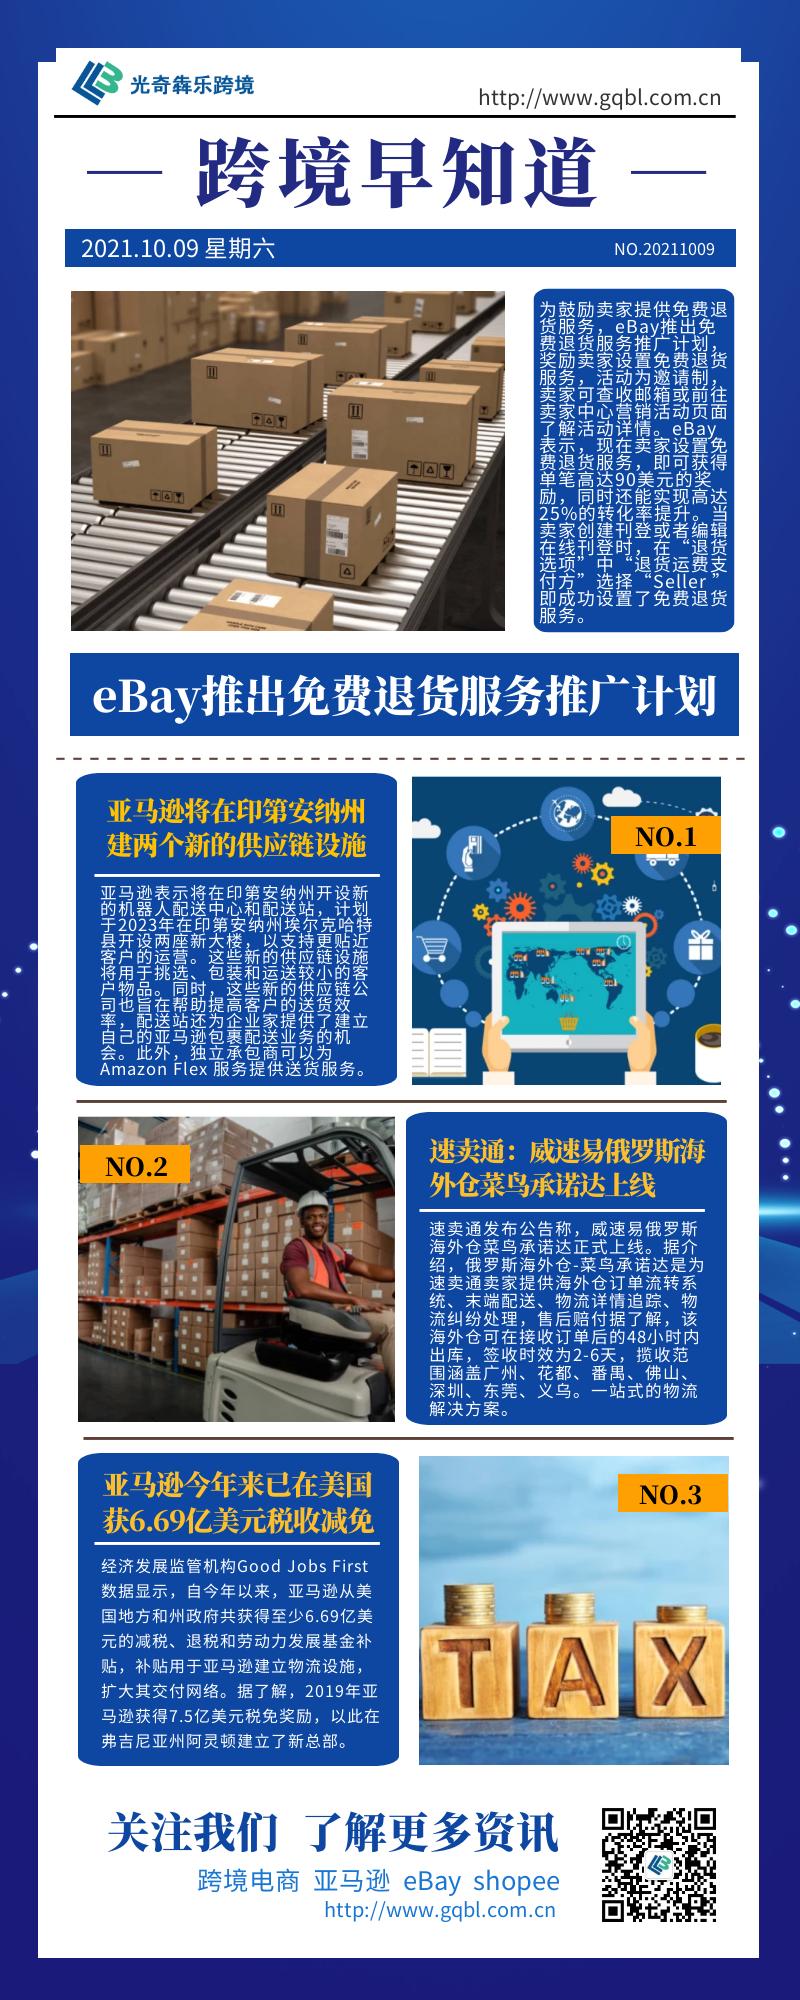 eBay推出免费退货服务推广计划